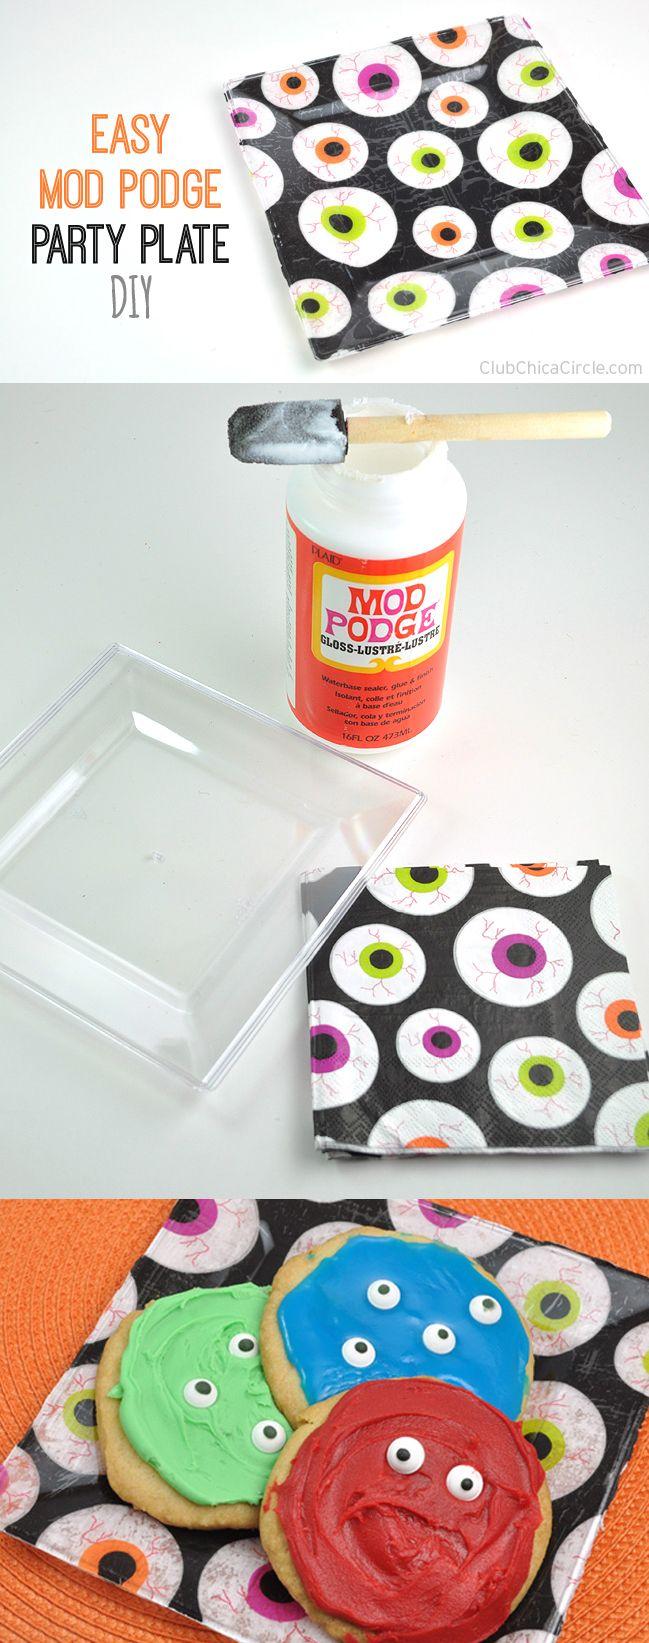 easy eyeball party plate craft idea with mod podge by club chica circle halloween birthdayhalloween decorationshalloween